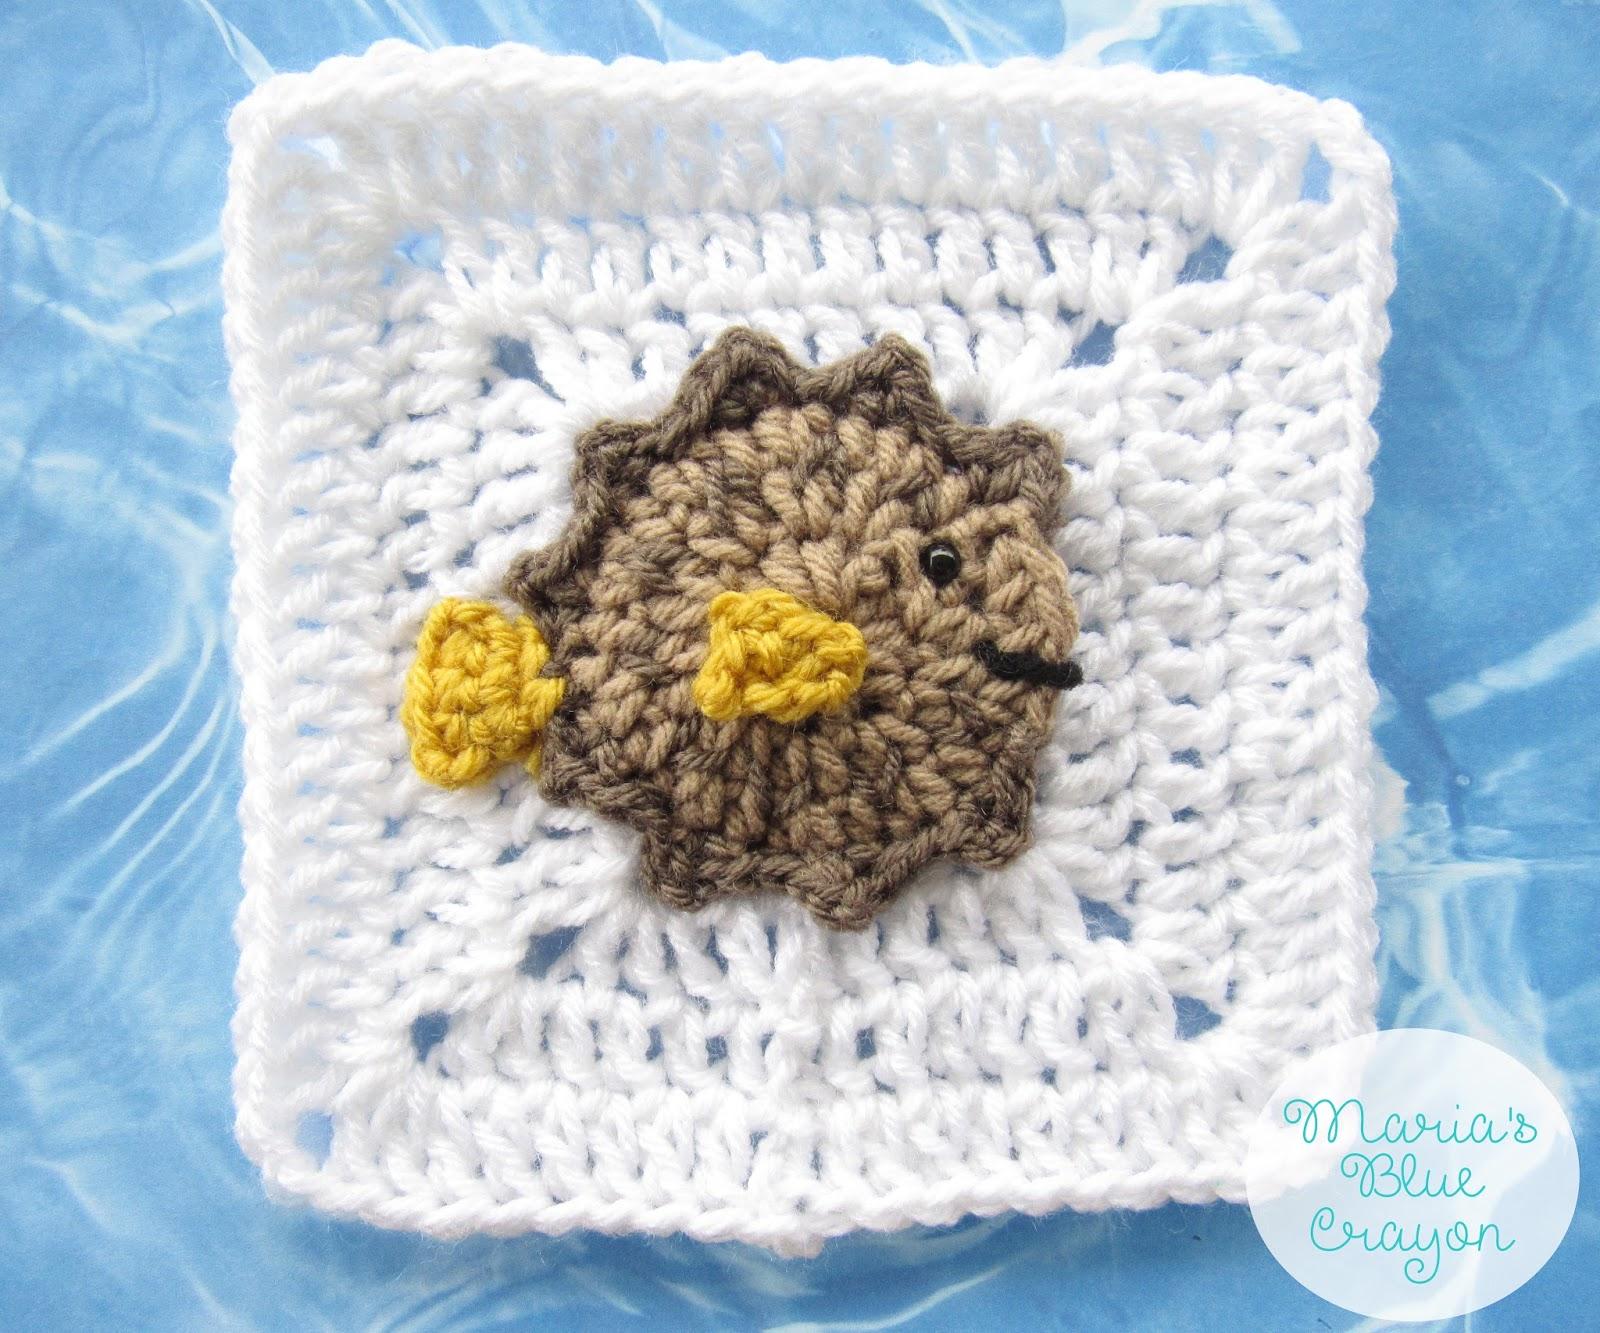 Crochet Puffer Fish Applique and Granny Square Free Crochet Pattern ...